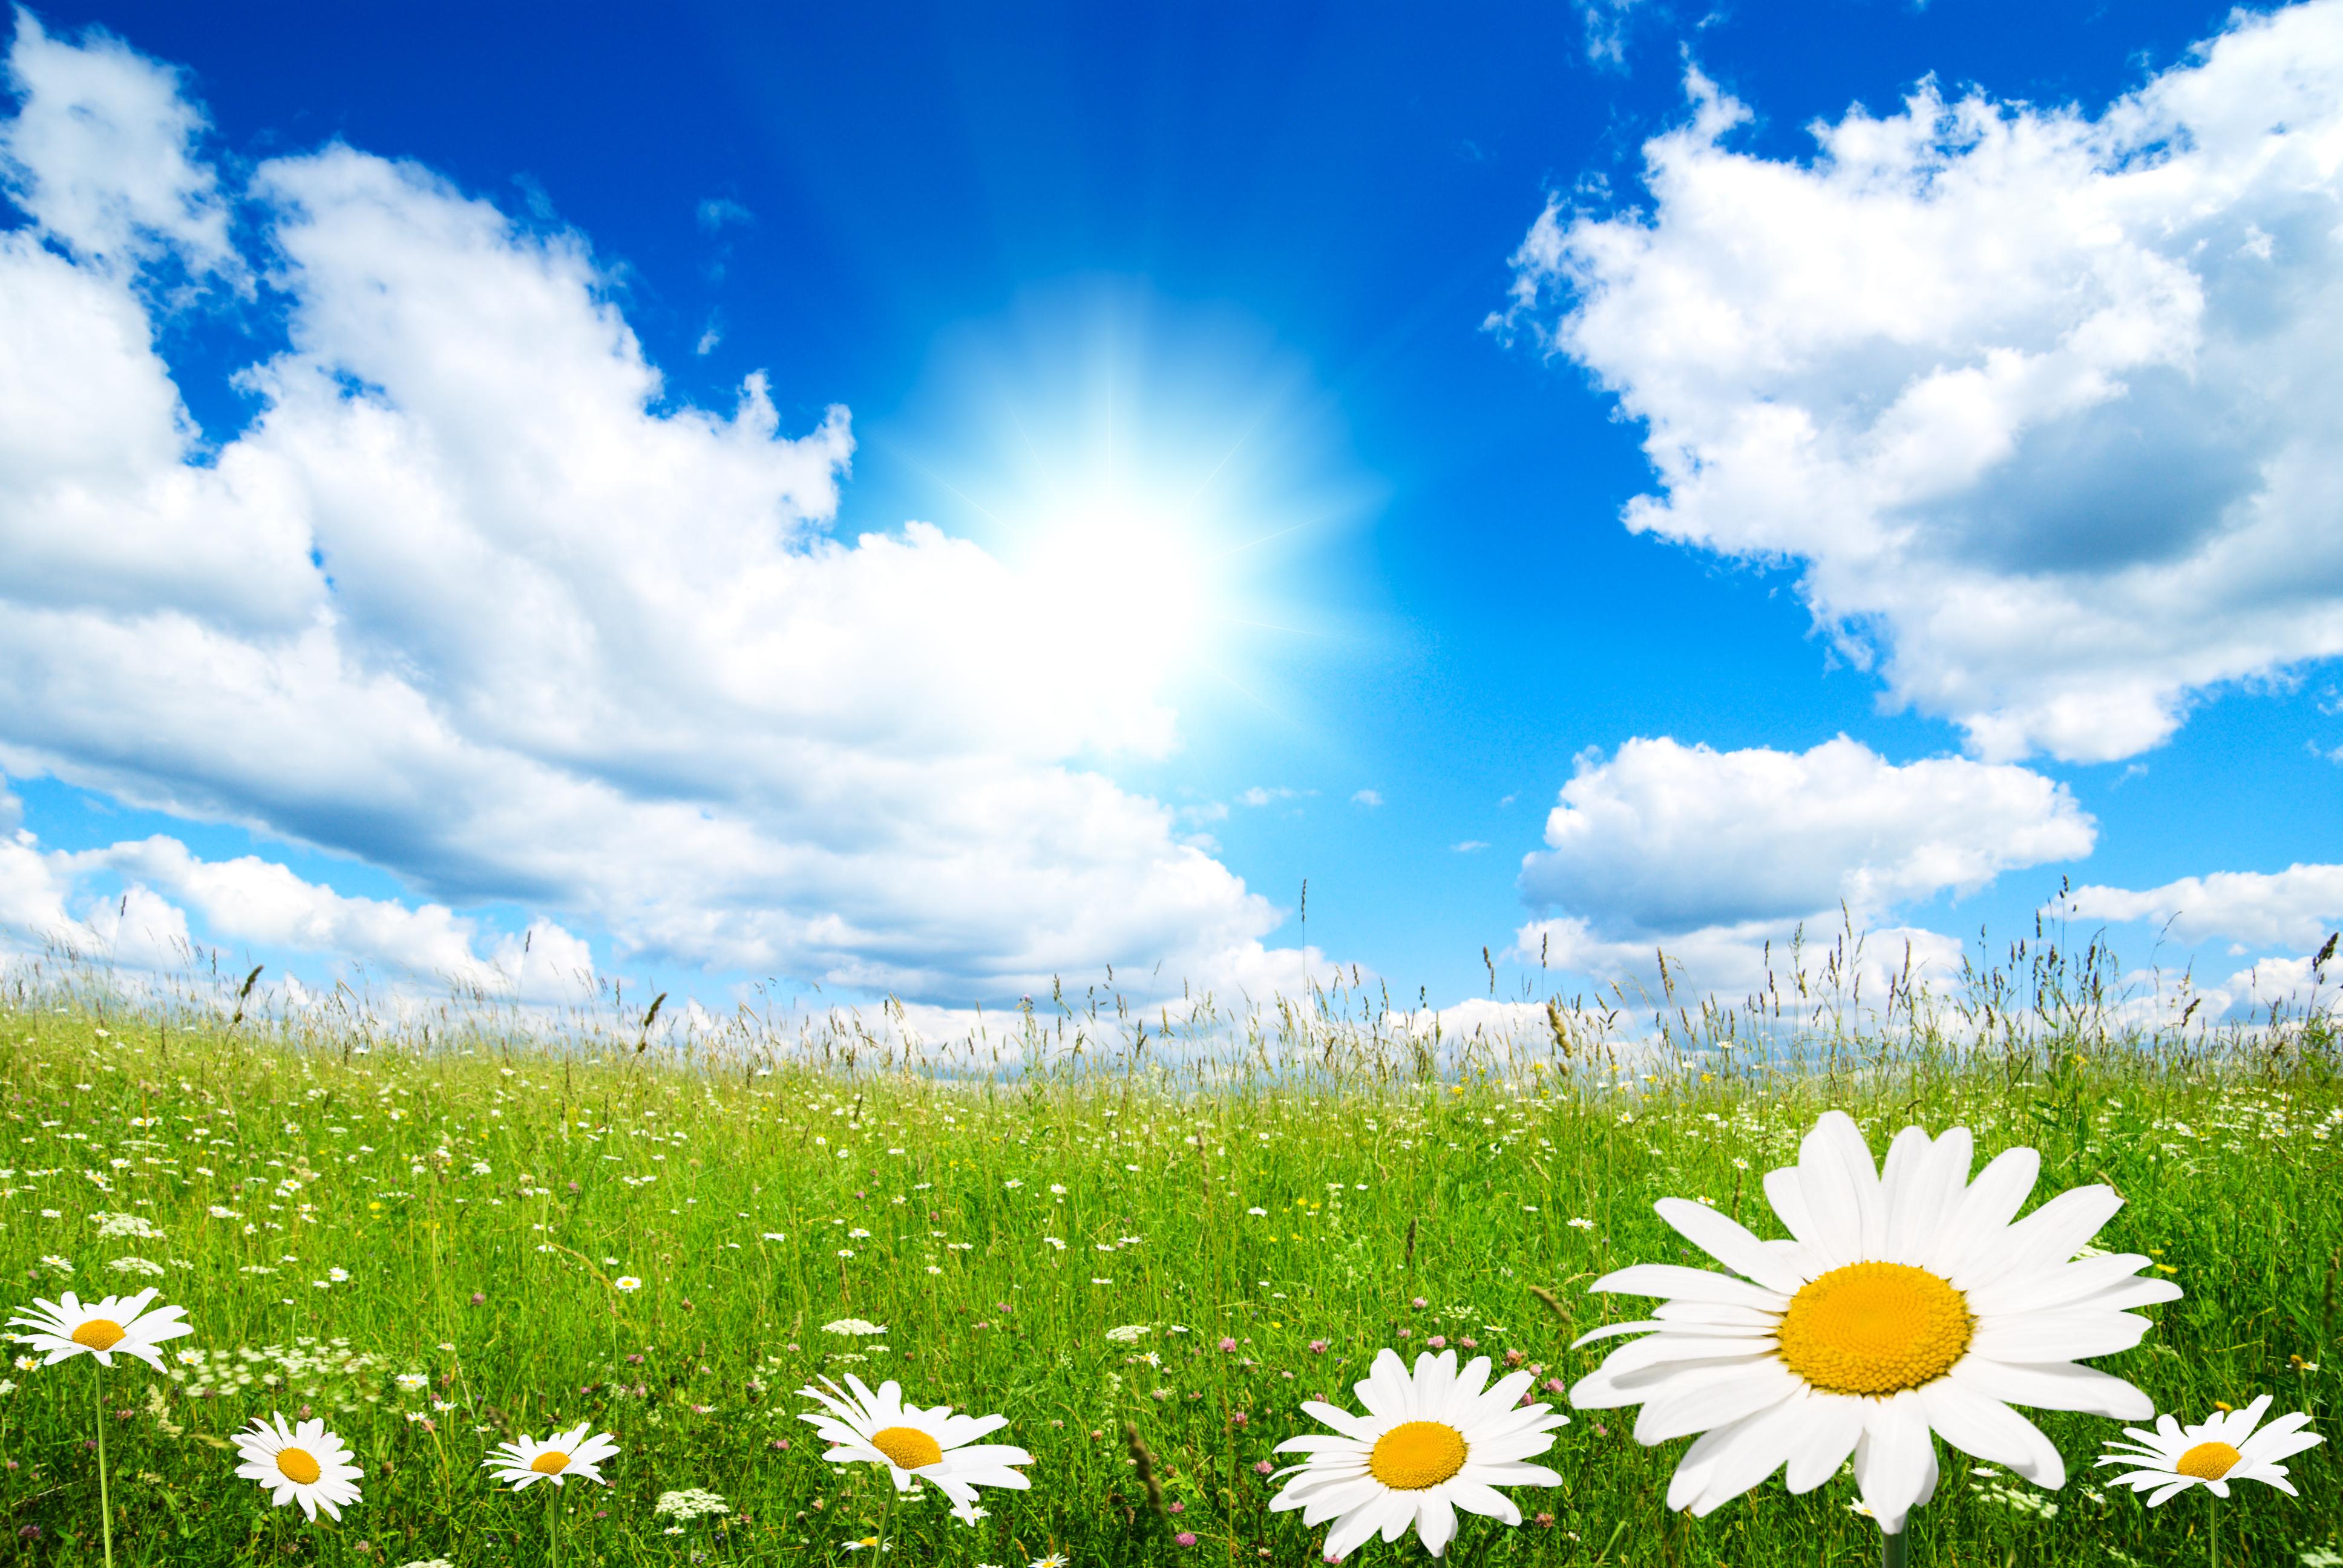 Springtime HD Screensavers And Wallpaper photos of 3872x2592